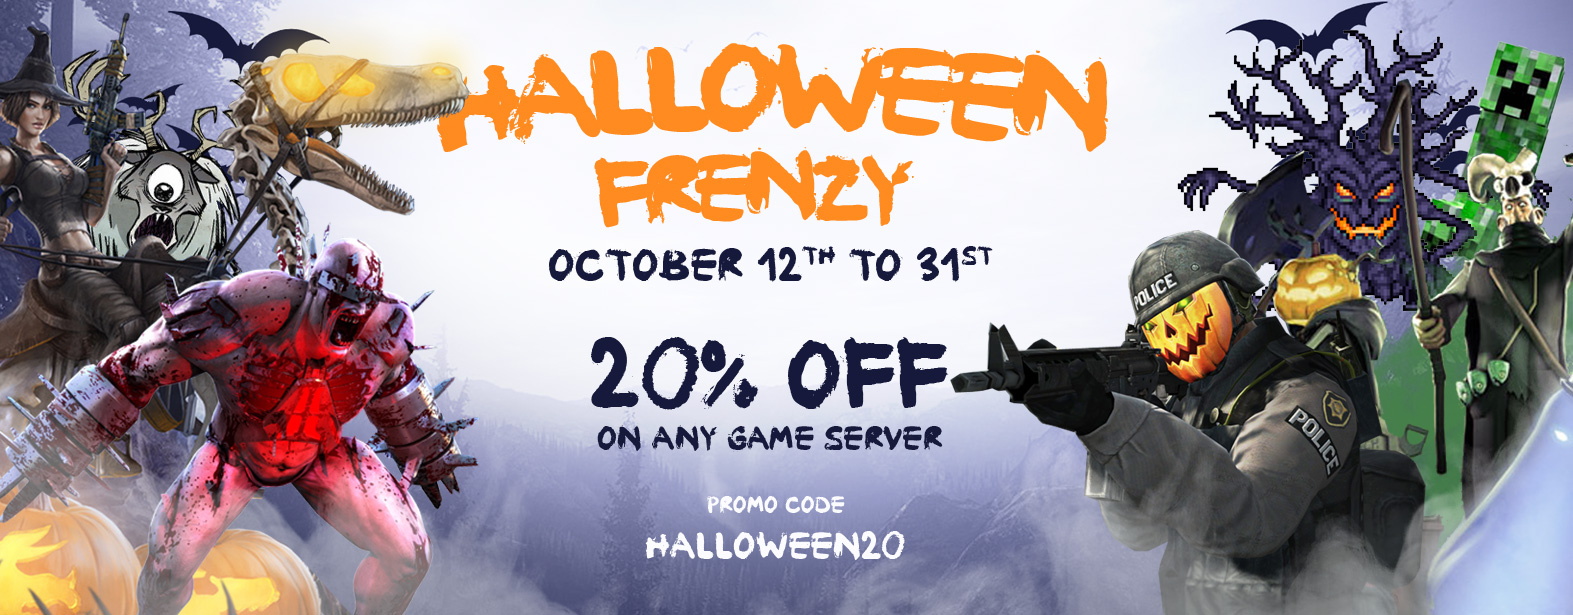 halloween_frenzy_2017.jpg